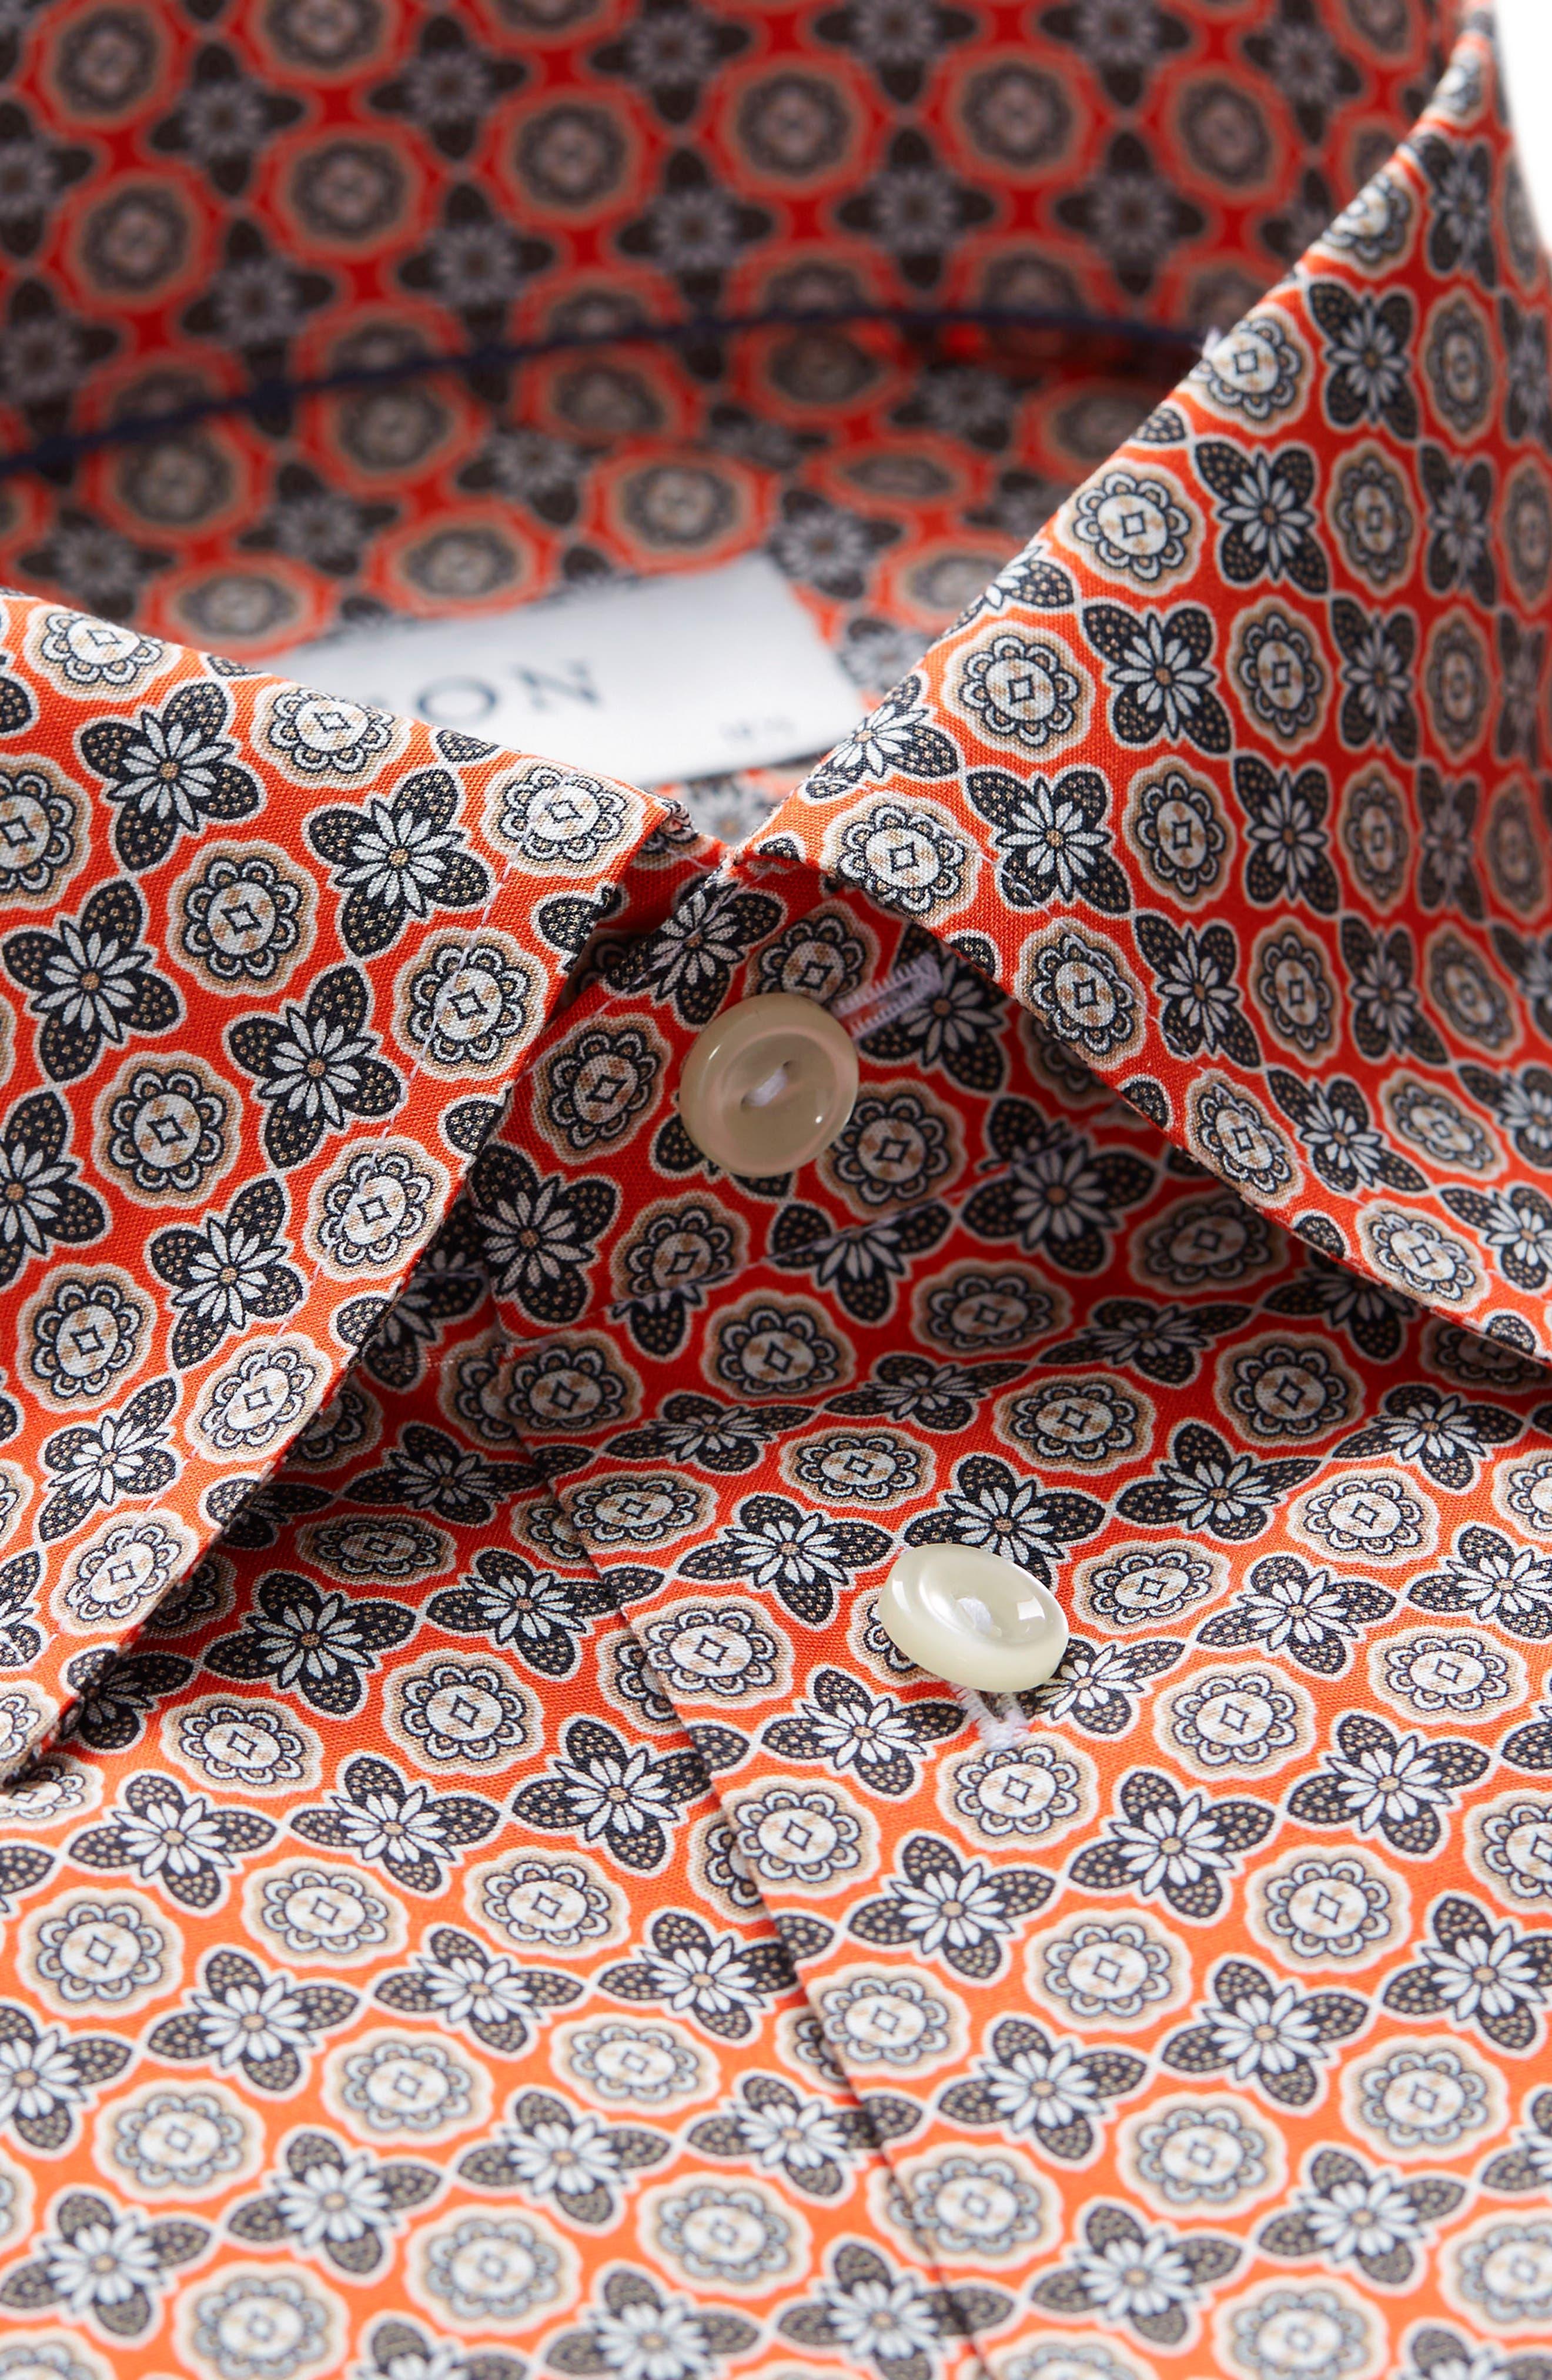 Slim Fit Floral Geometric Dress Shirt,                             Alternate thumbnail 2, color,                             Yellow/ Orange